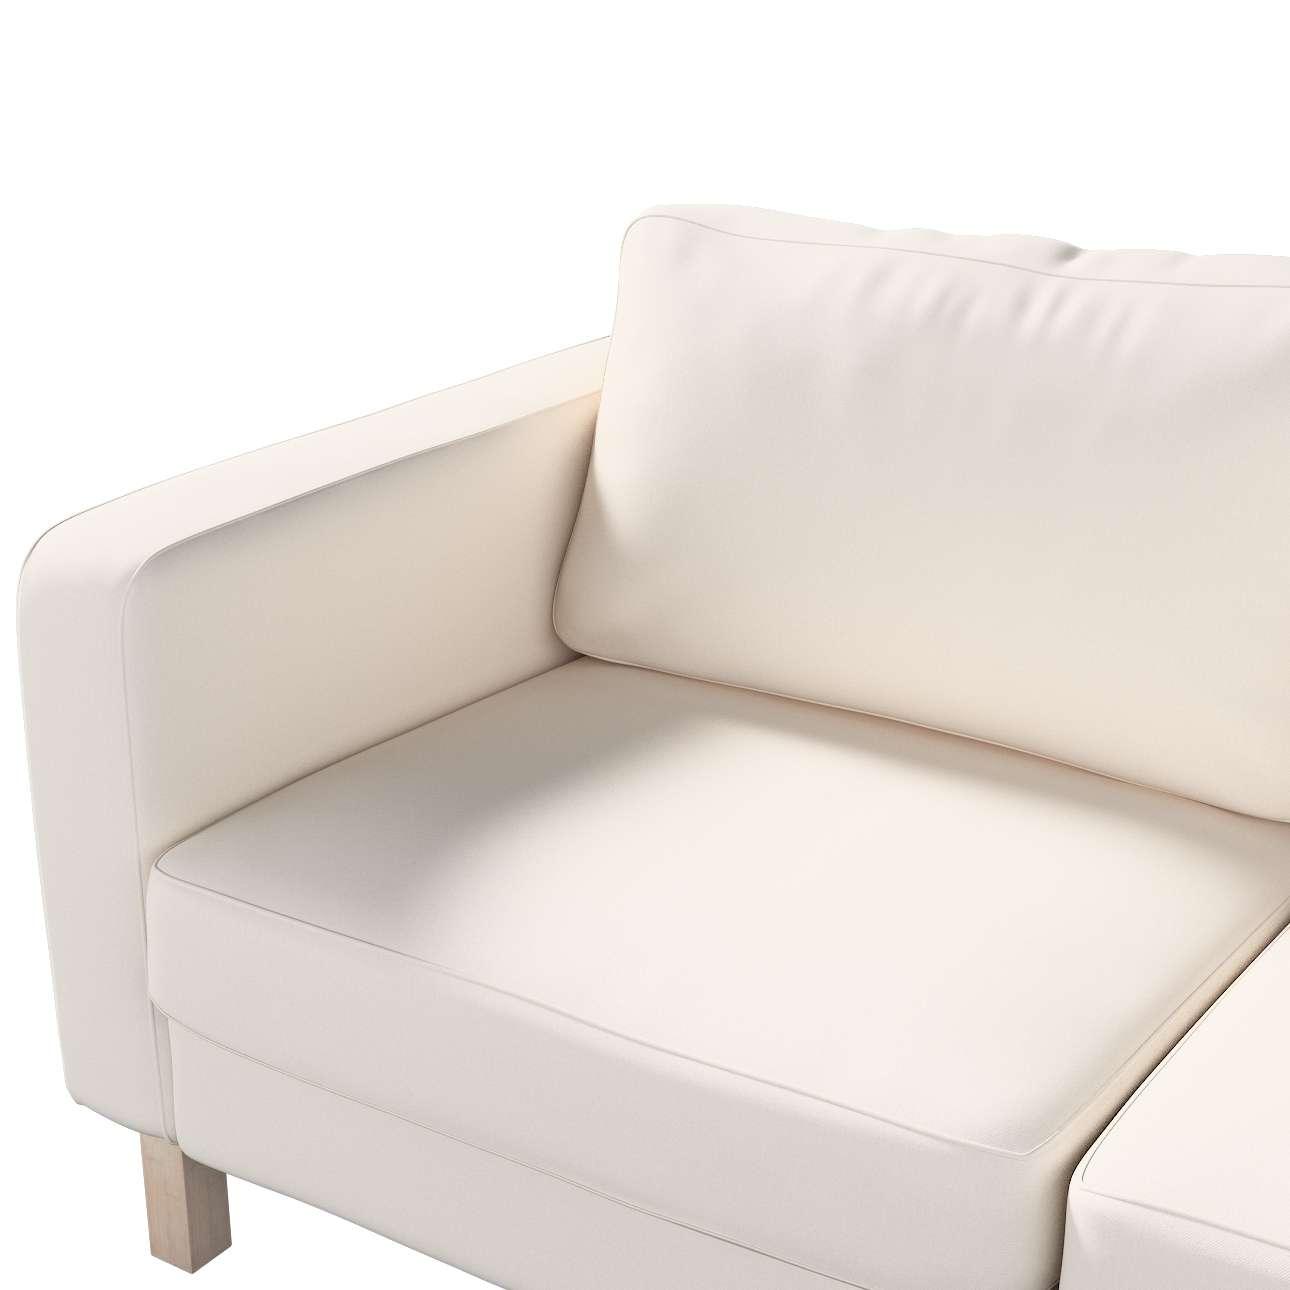 KARSLTAD dvivietės sofos užvalkalas kolekcijoje Etna , audinys: 705-01